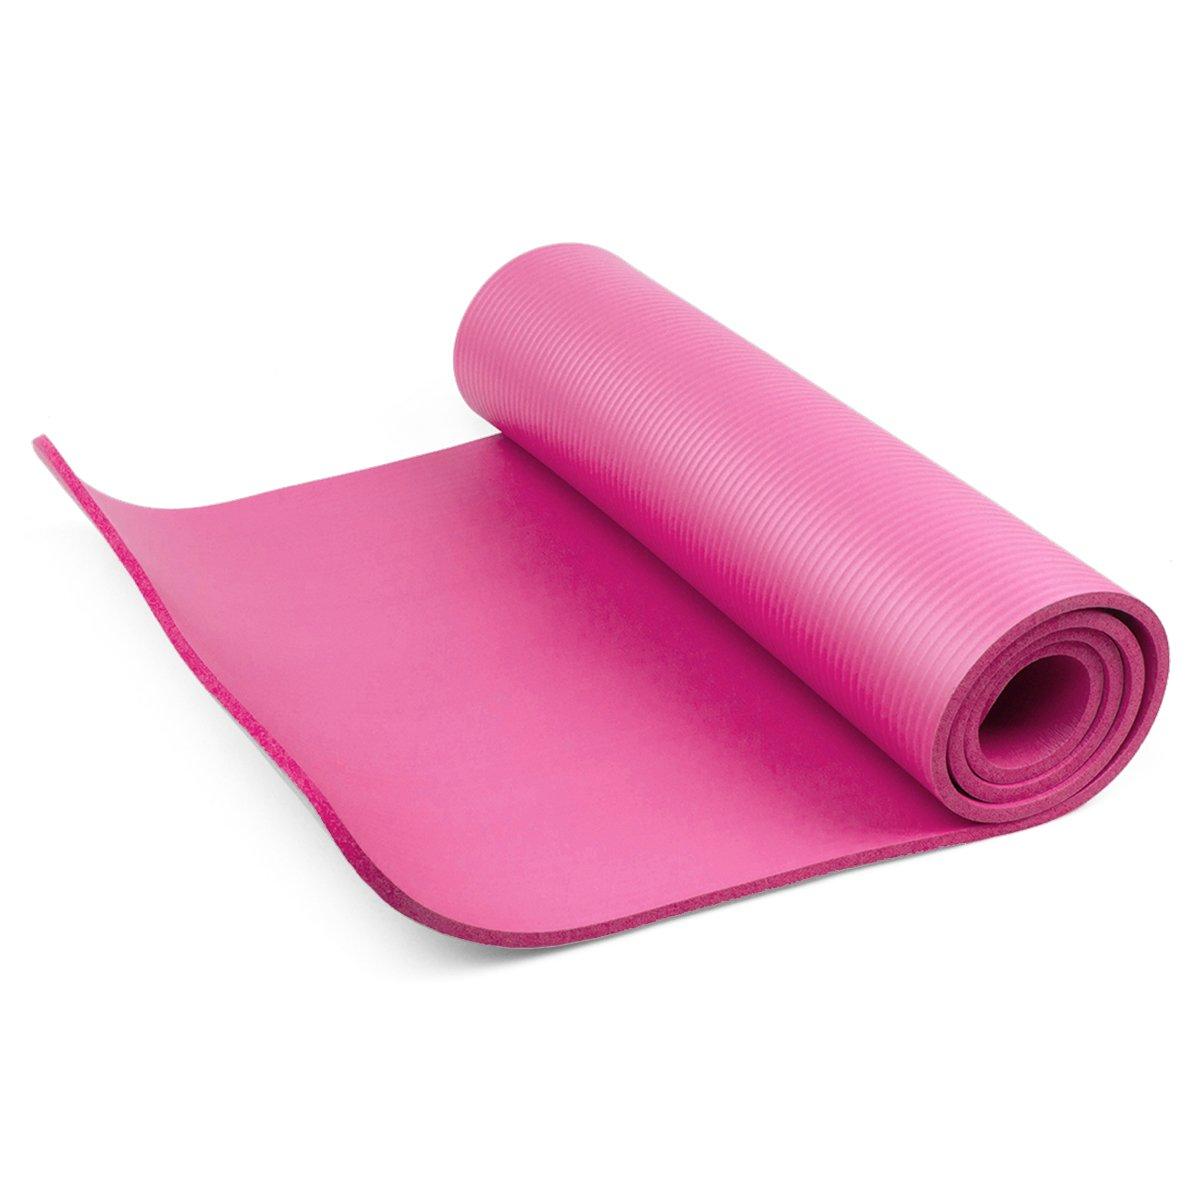 diMio - Esterilla de Yoga o Pilates, 185 x 60 cm, 5 Colores, 2 grosores, Antideslizante - Rosa - 185 x 60 x 1.5 cm